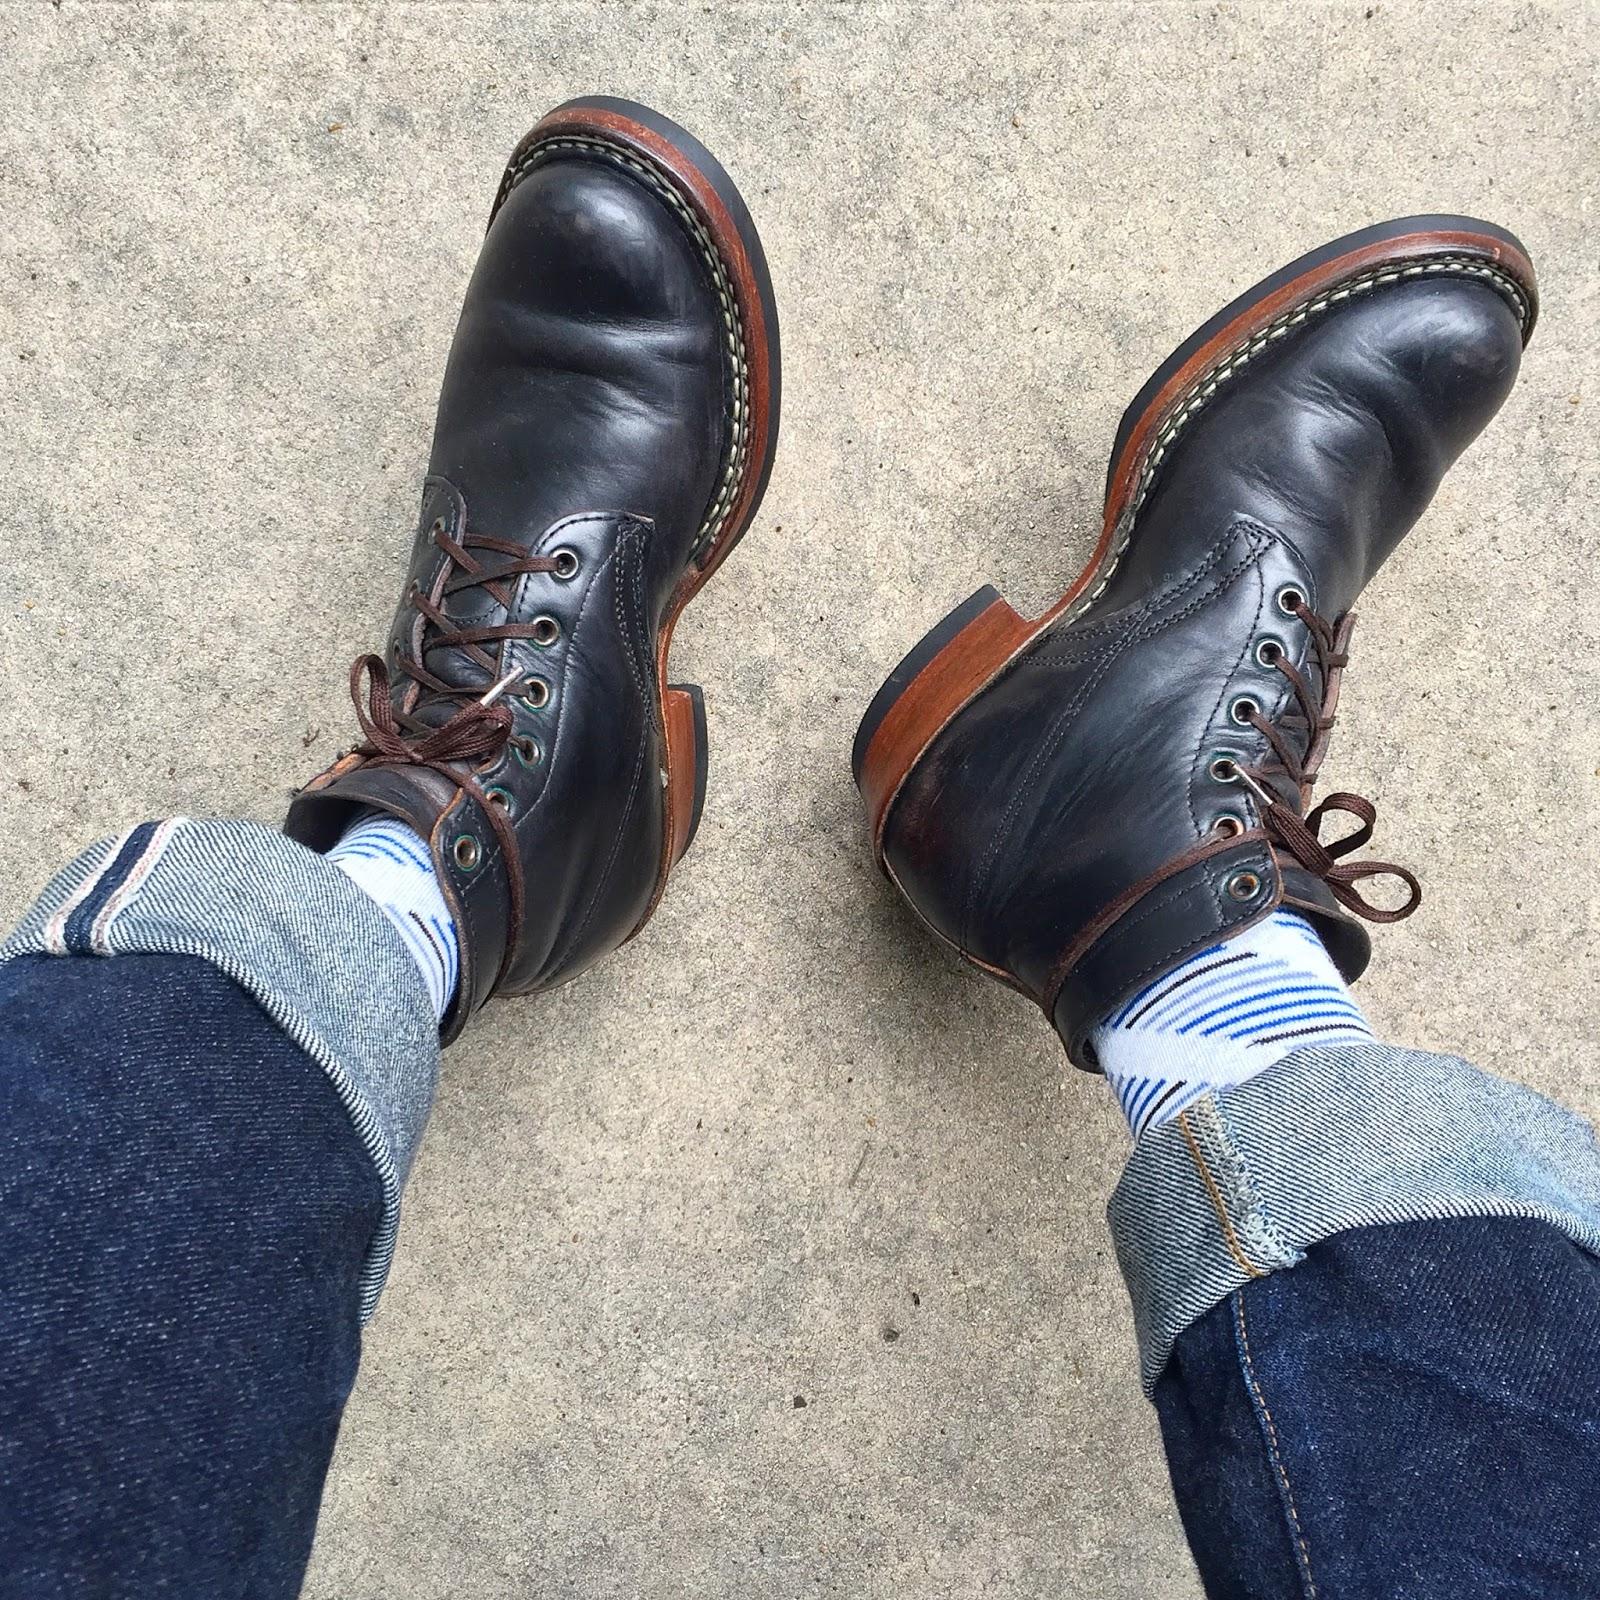 Vintage Engineer Boots: HORSEHIDE WHITES SEMI-DRESS